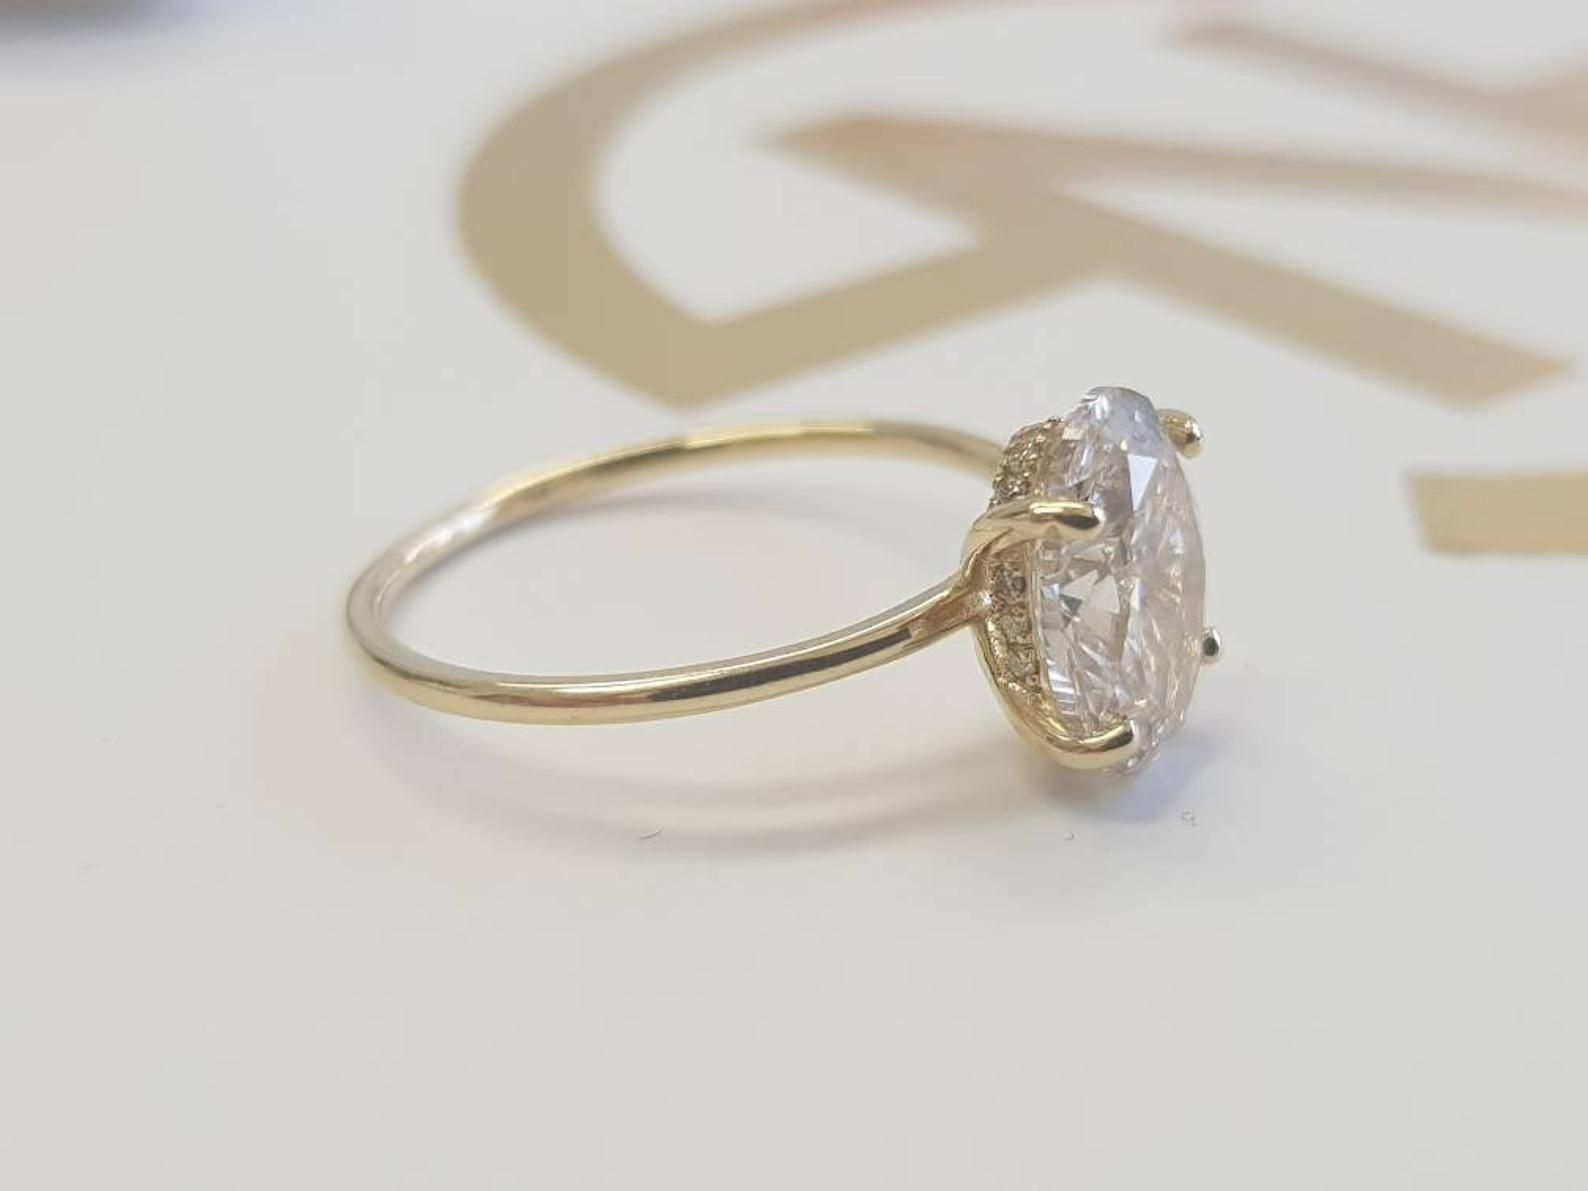 1 Carat Oval Diamond Engagement Ring Hidden Halo 14k Yellow Etsy Oval Diamond Engagement Ring Solitaire Engagement Ring Oval Diamond Engagement